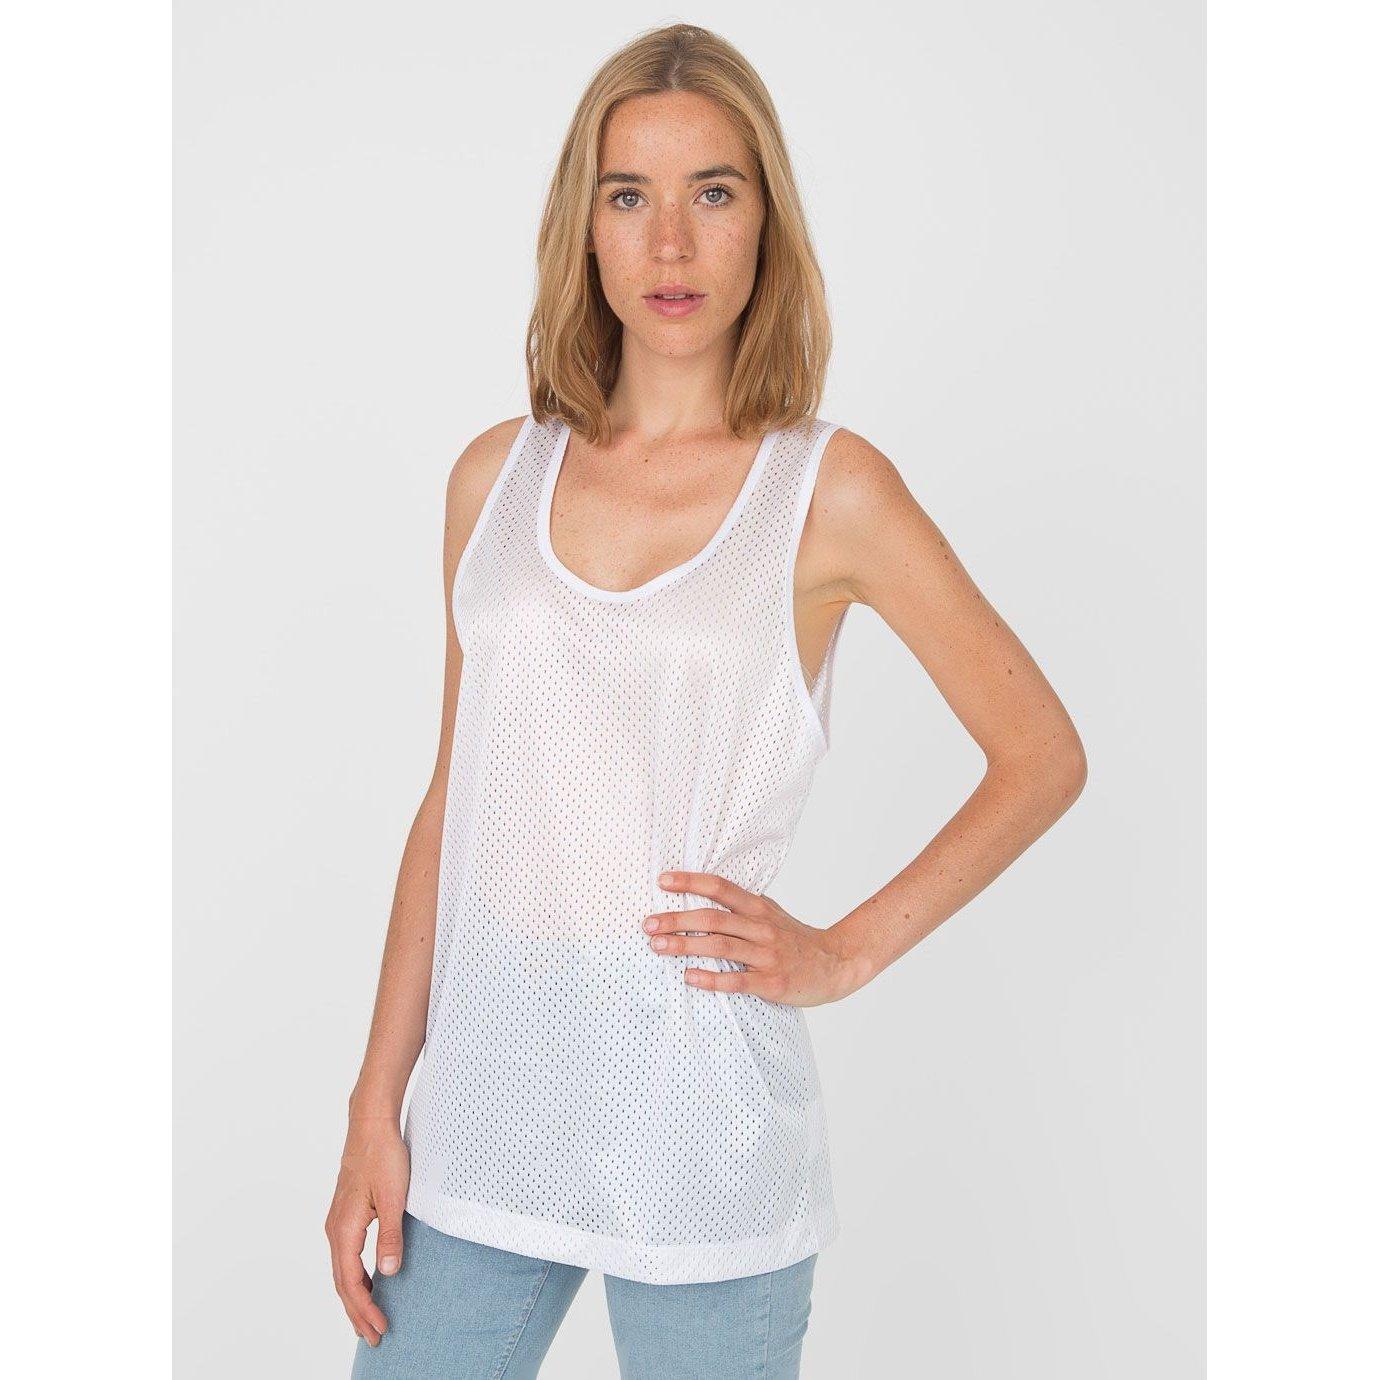 American Apparel Unisex Lightweight Mesh Sports Vest/Tank Top (L) (White)